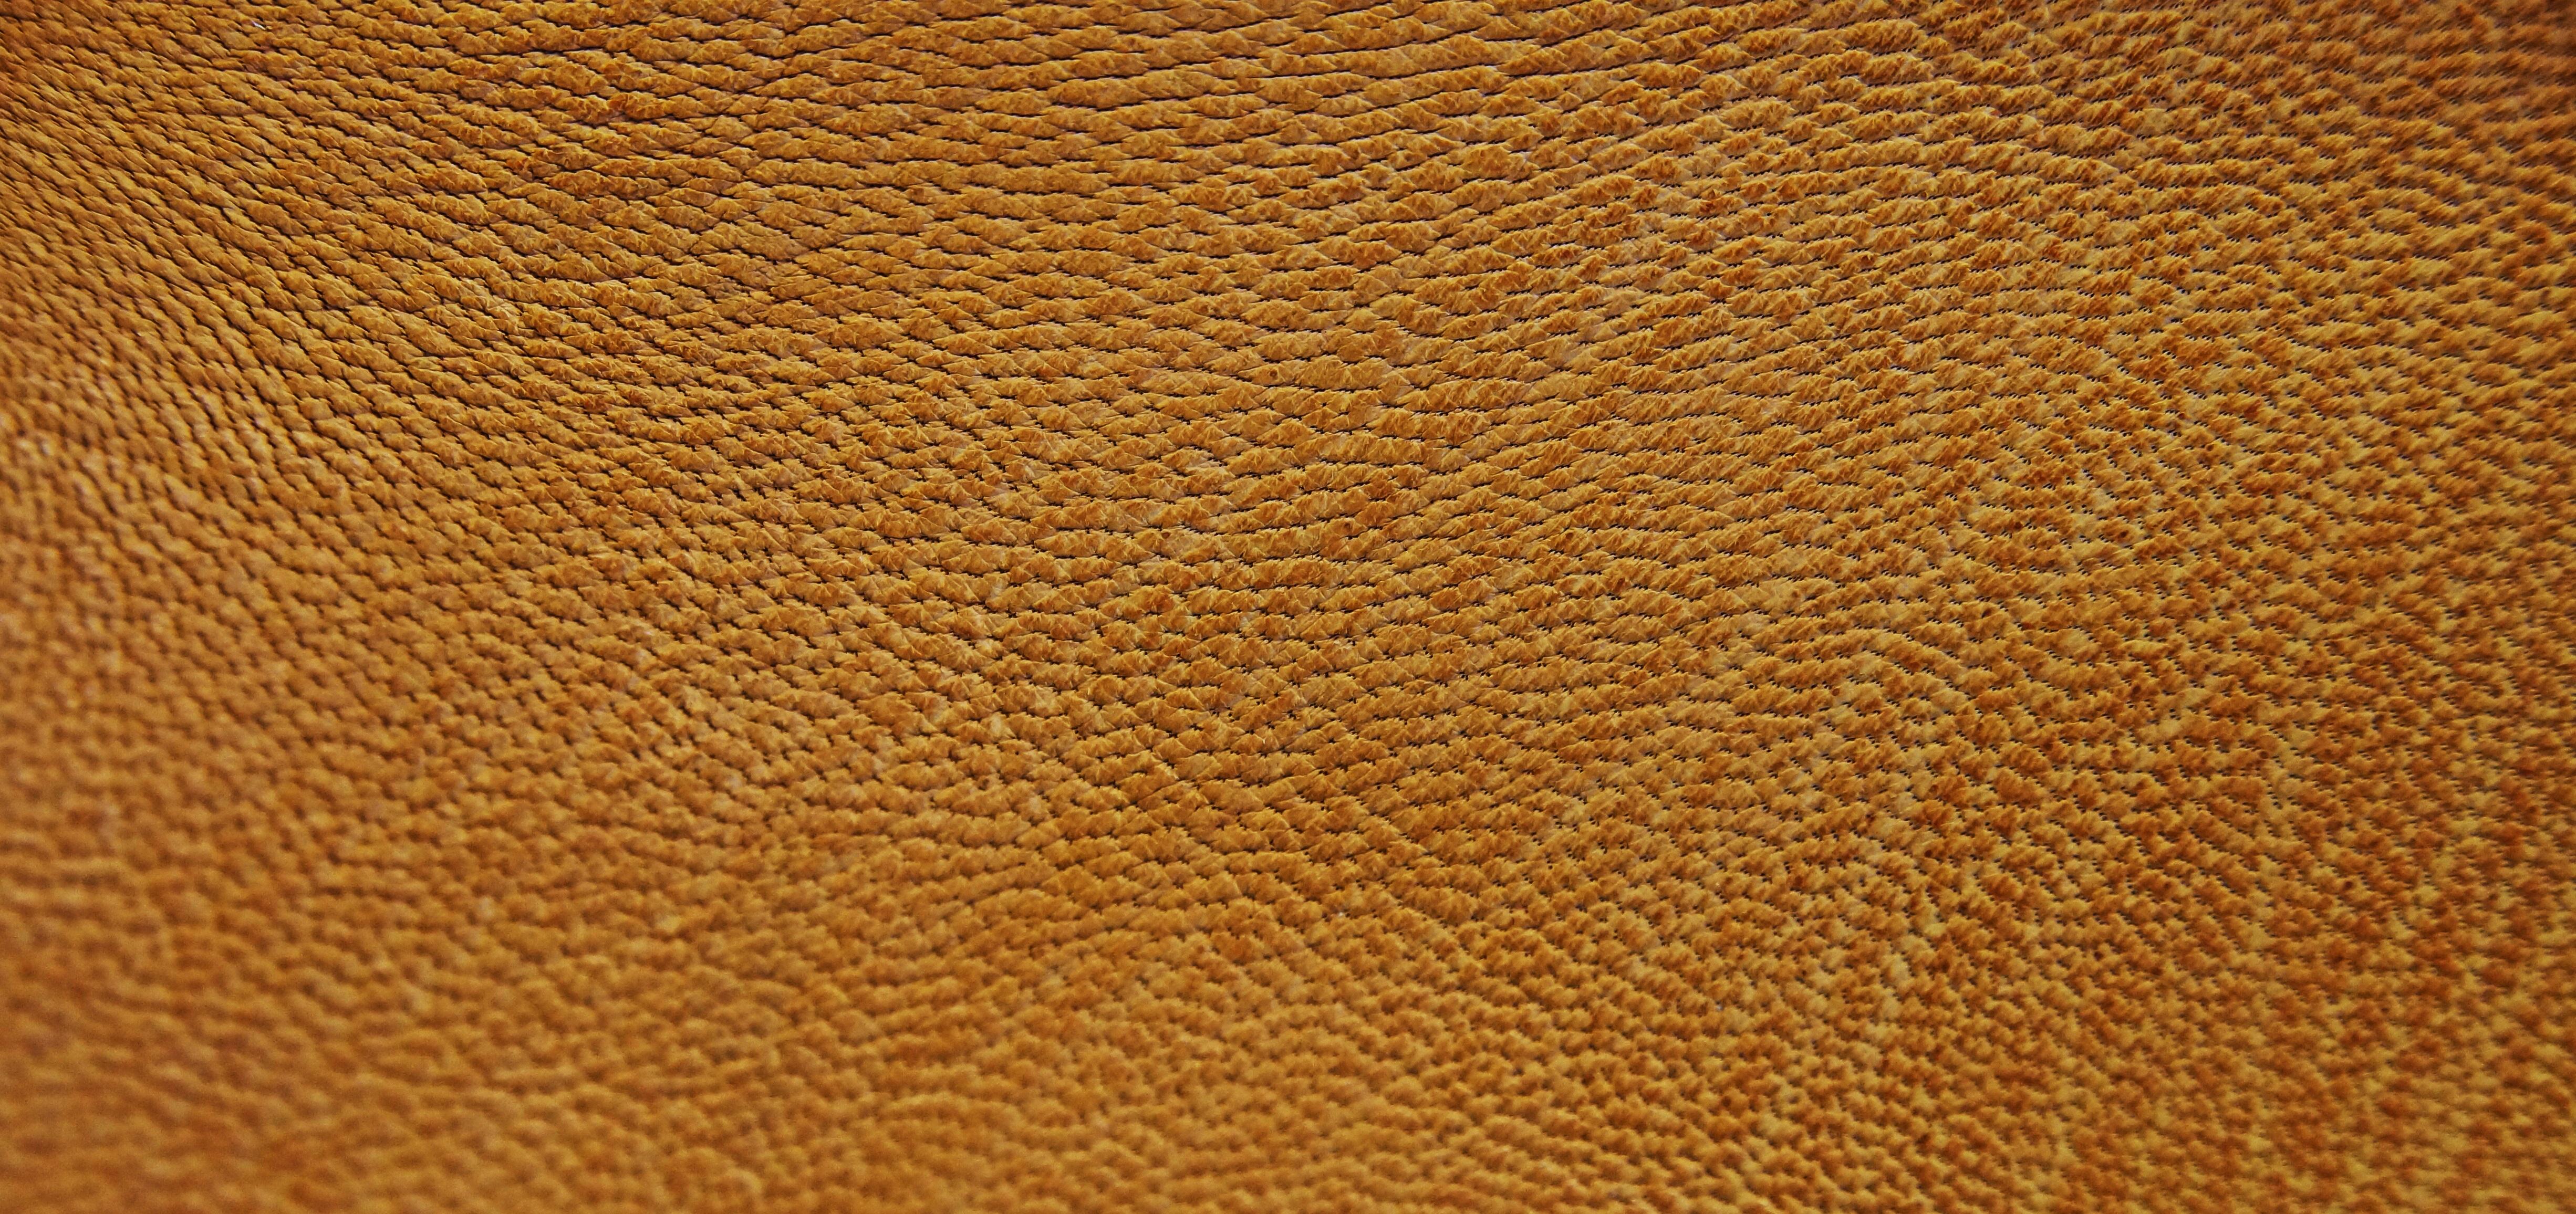 Free Images Structure Wood Texture Floor Fur Orange